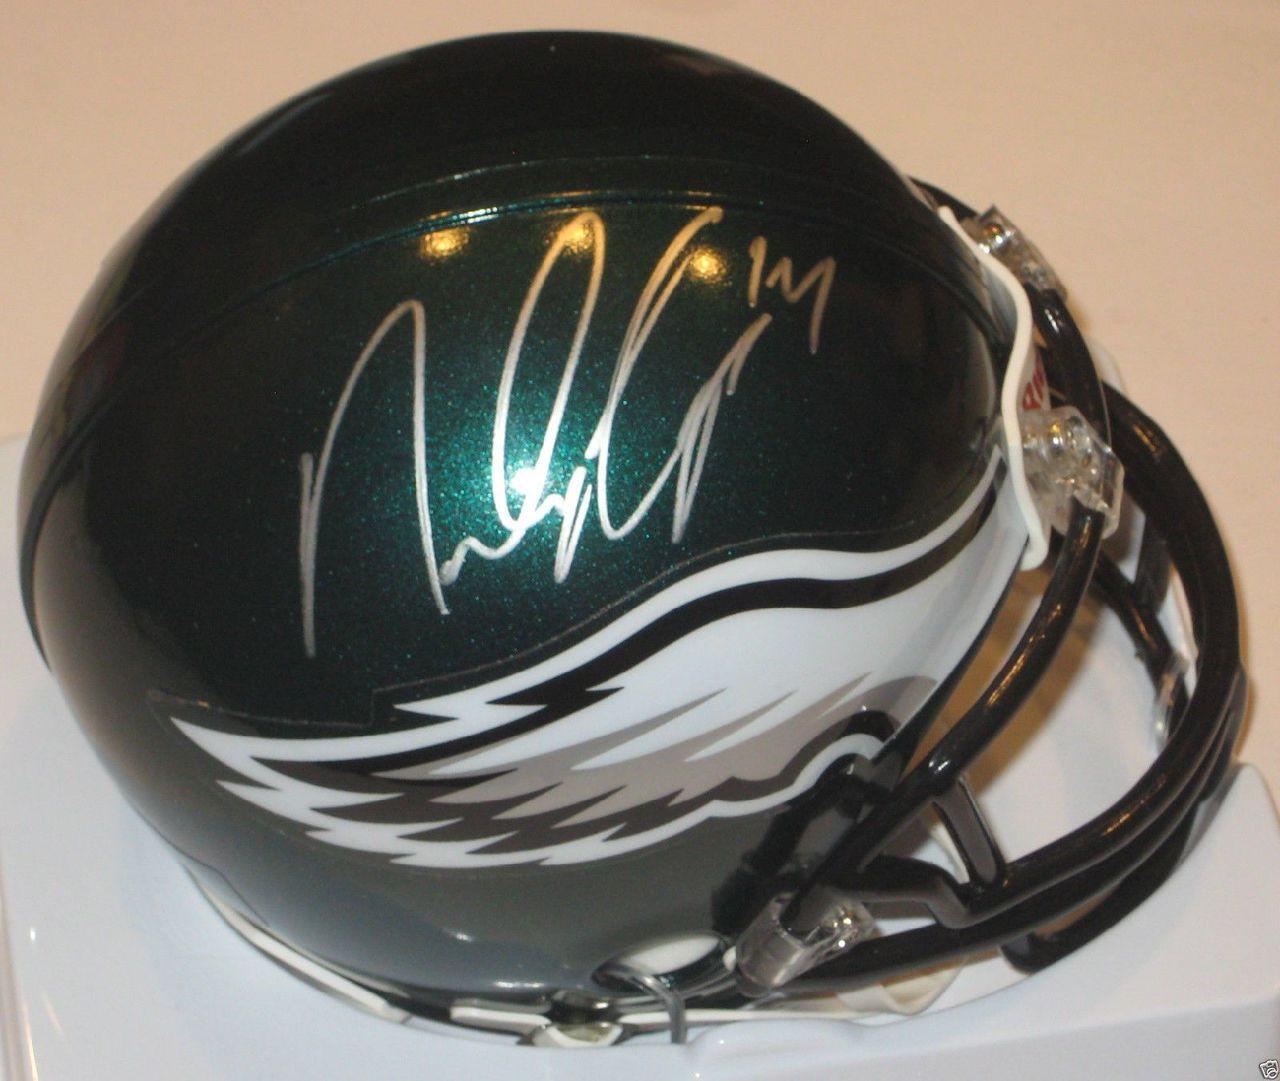 release date 4ffda b936f Riley Cooper Philadelphia Eagles Autographed Mini Football Helmet